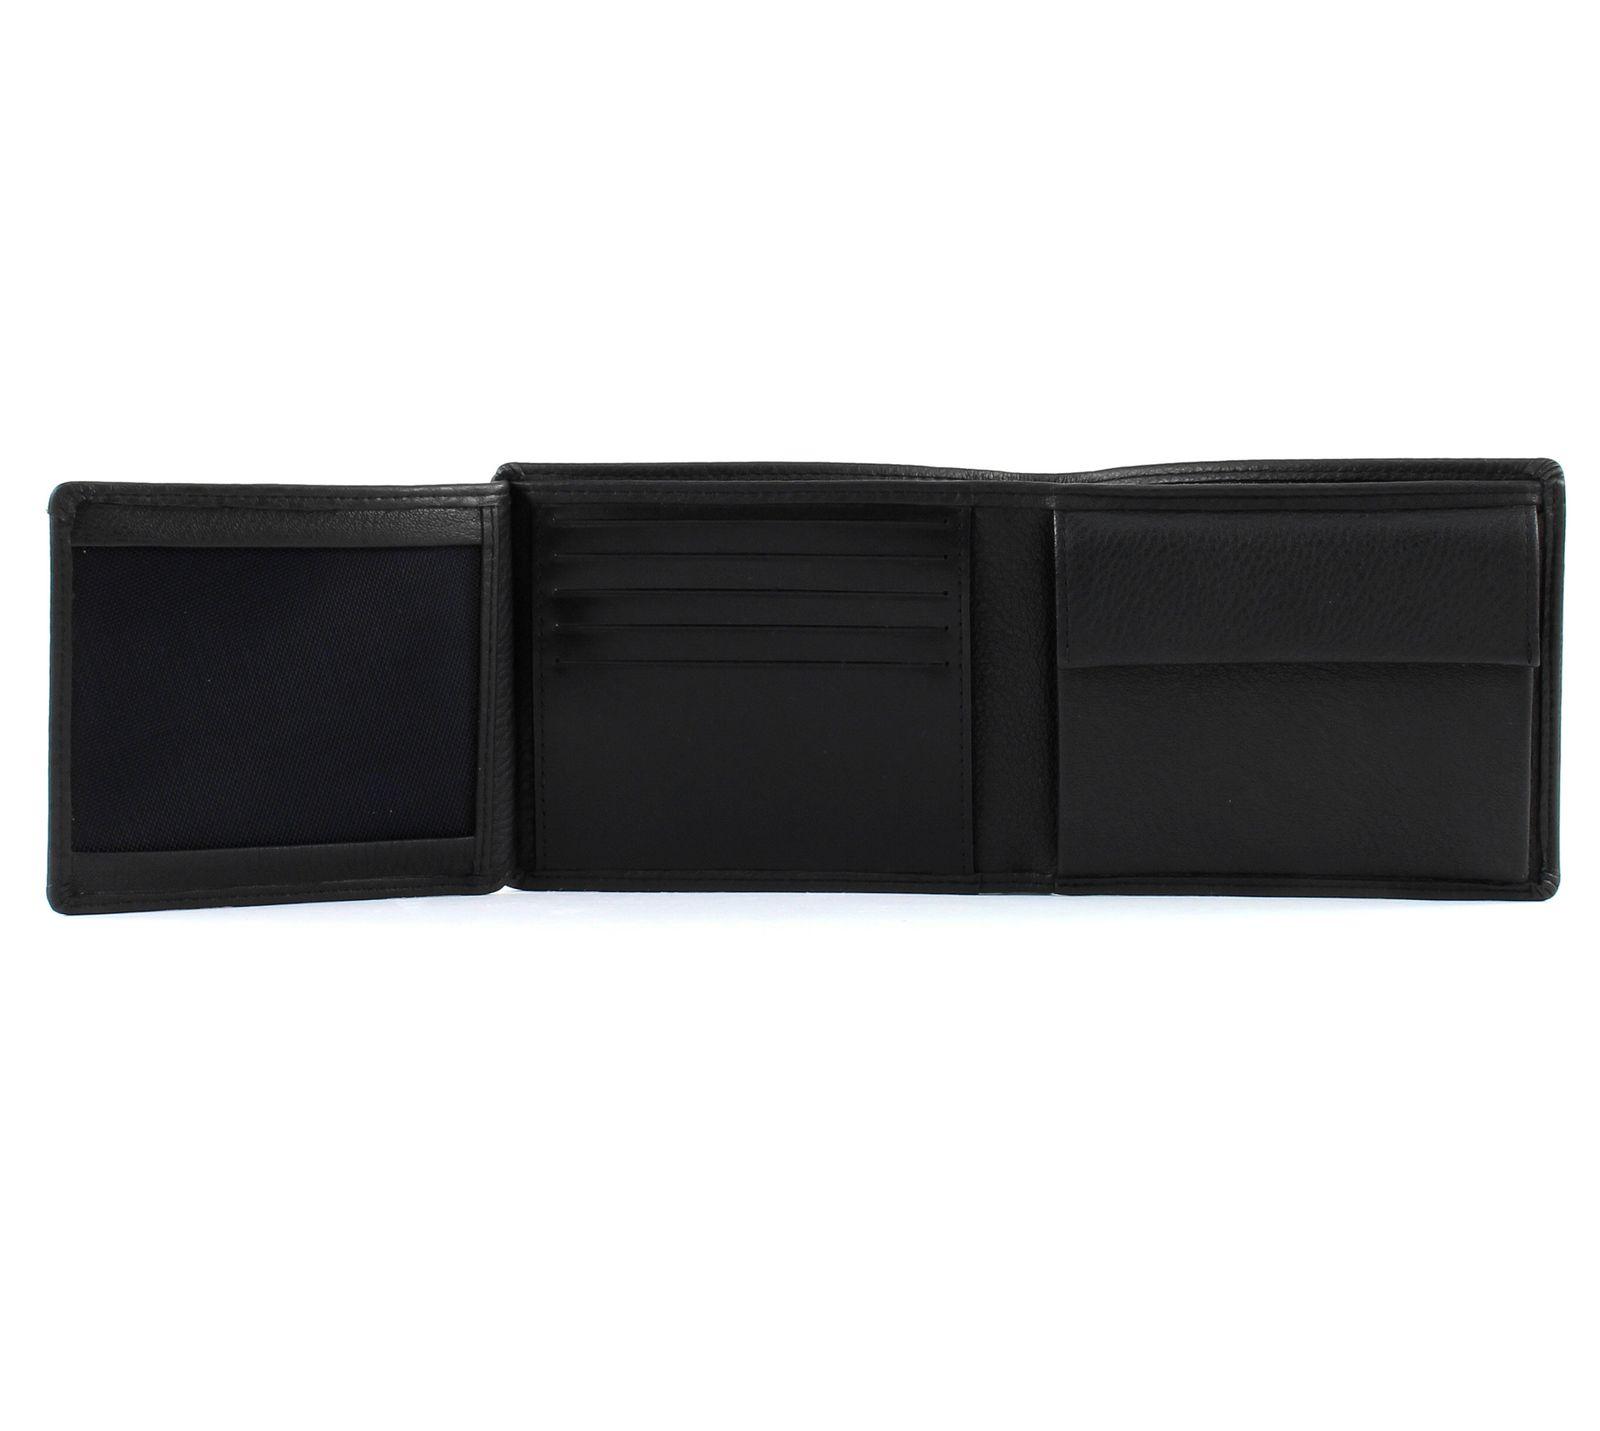 porsche design voyager 2 0 billfold h10 geldb rse black. Black Bedroom Furniture Sets. Home Design Ideas